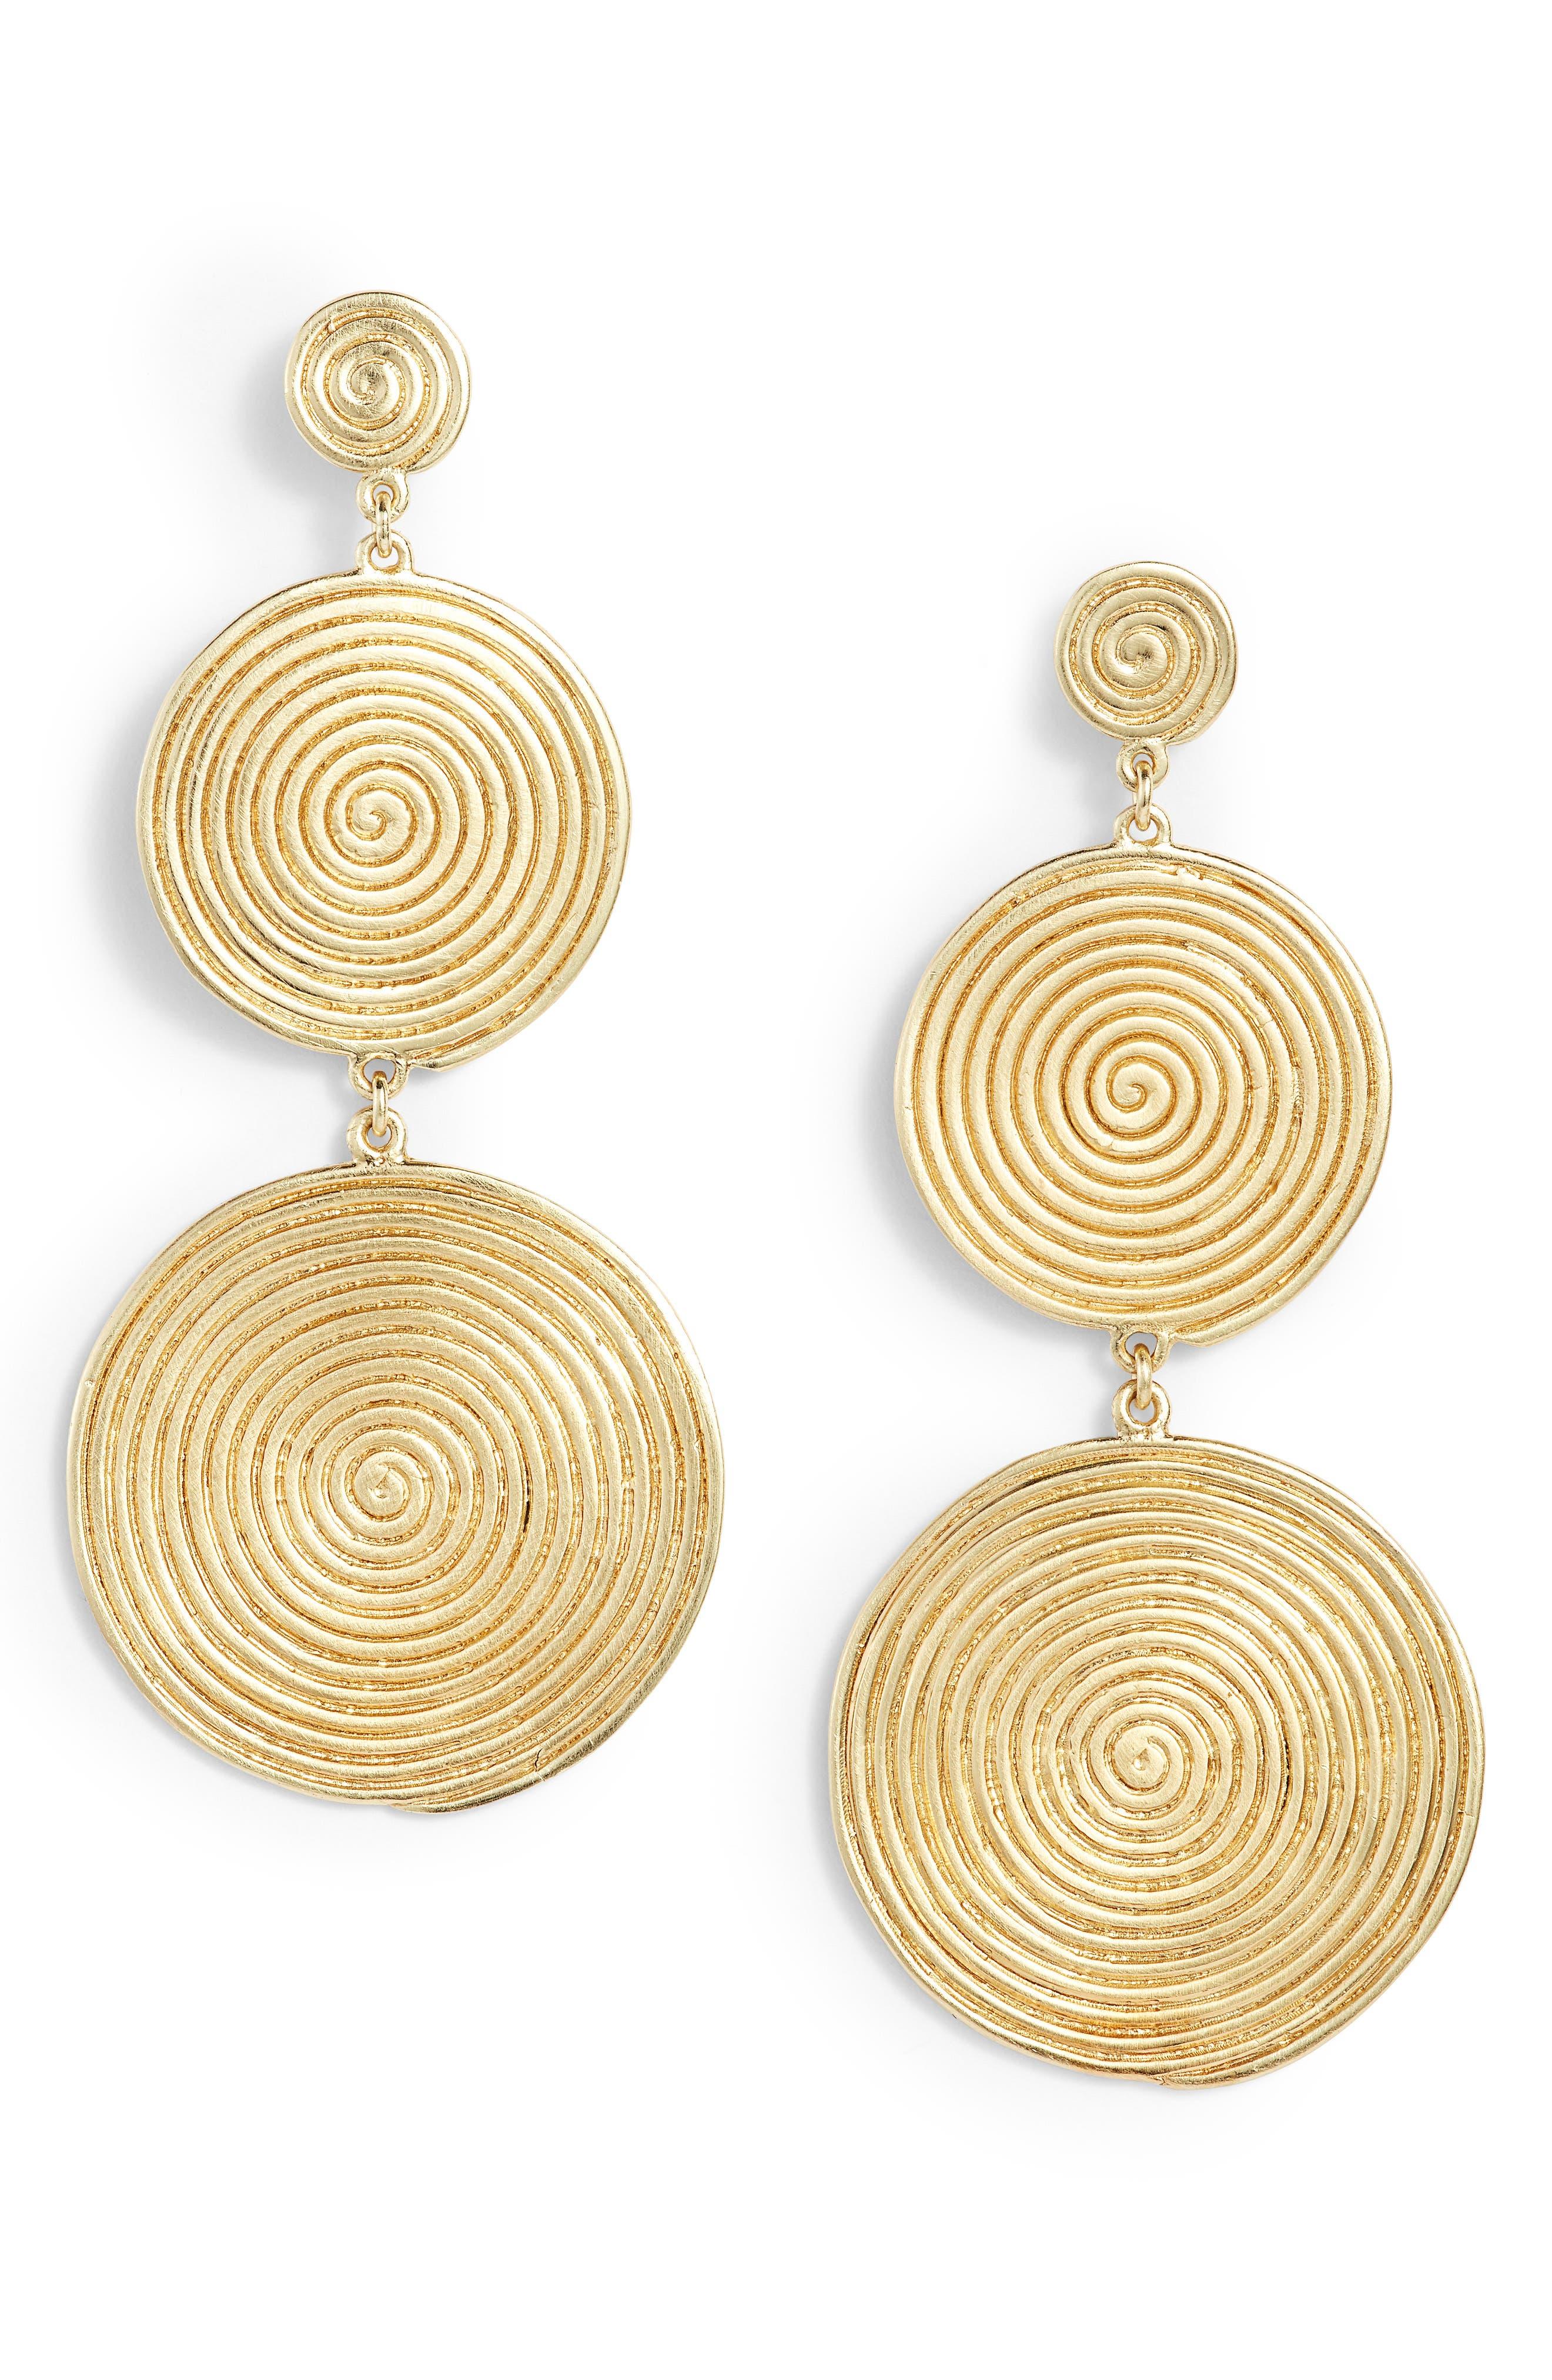 Elizabeth and James Sullivan - Lorelai Drop Earrings